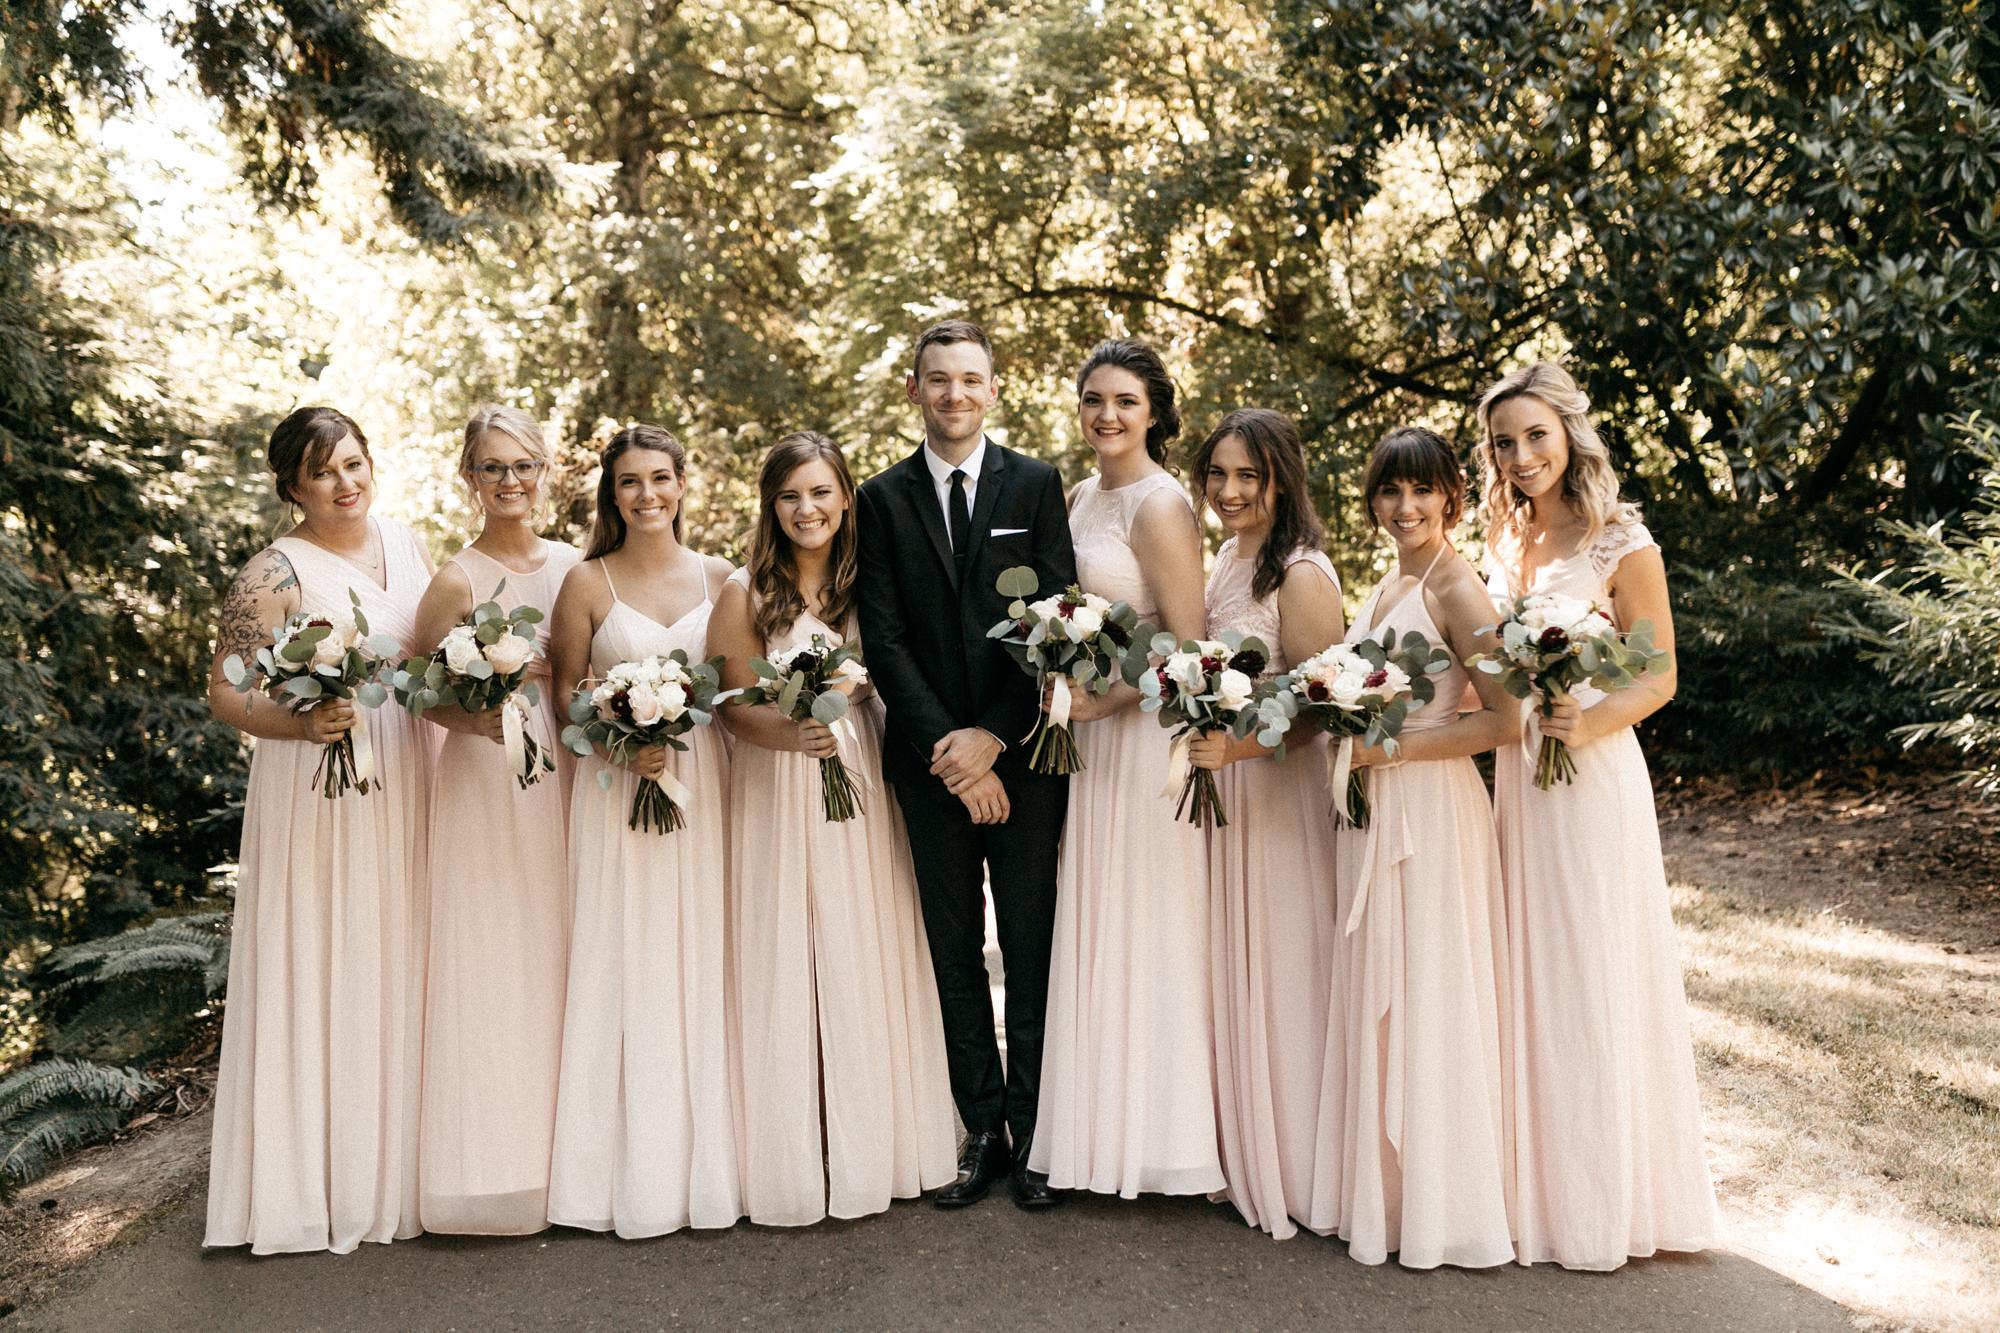 the_evergreen_portland_wedding-36.jpg